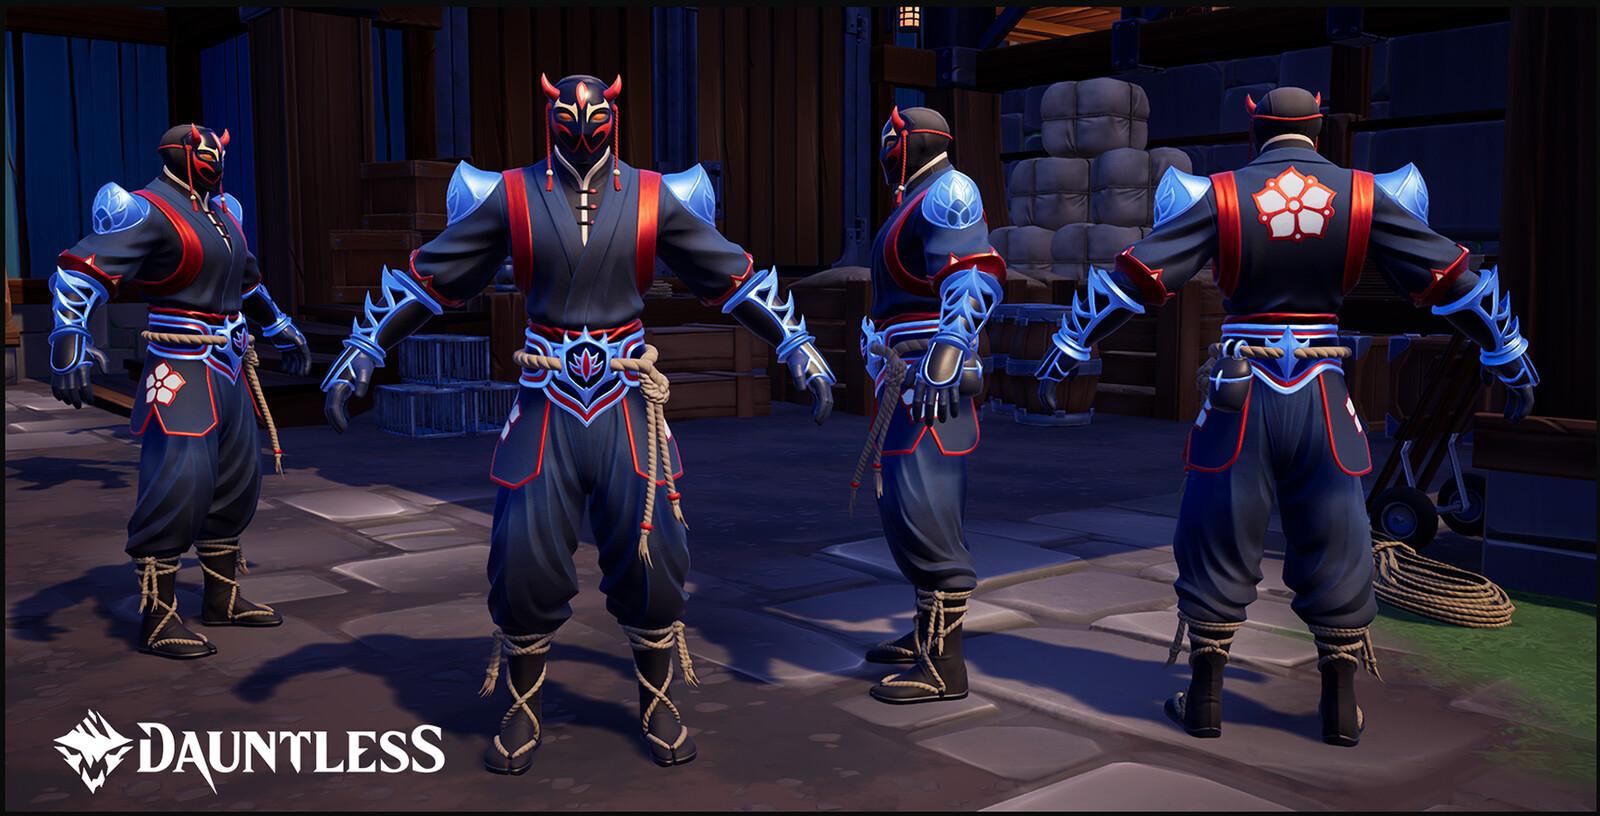 Mask:  Laughging Death, LVL 15 Hunt Pass Reward Armour: Shadow Armor Set, LVL 1 Hunt Pass reward. Both items for the season of Hidden Blades.